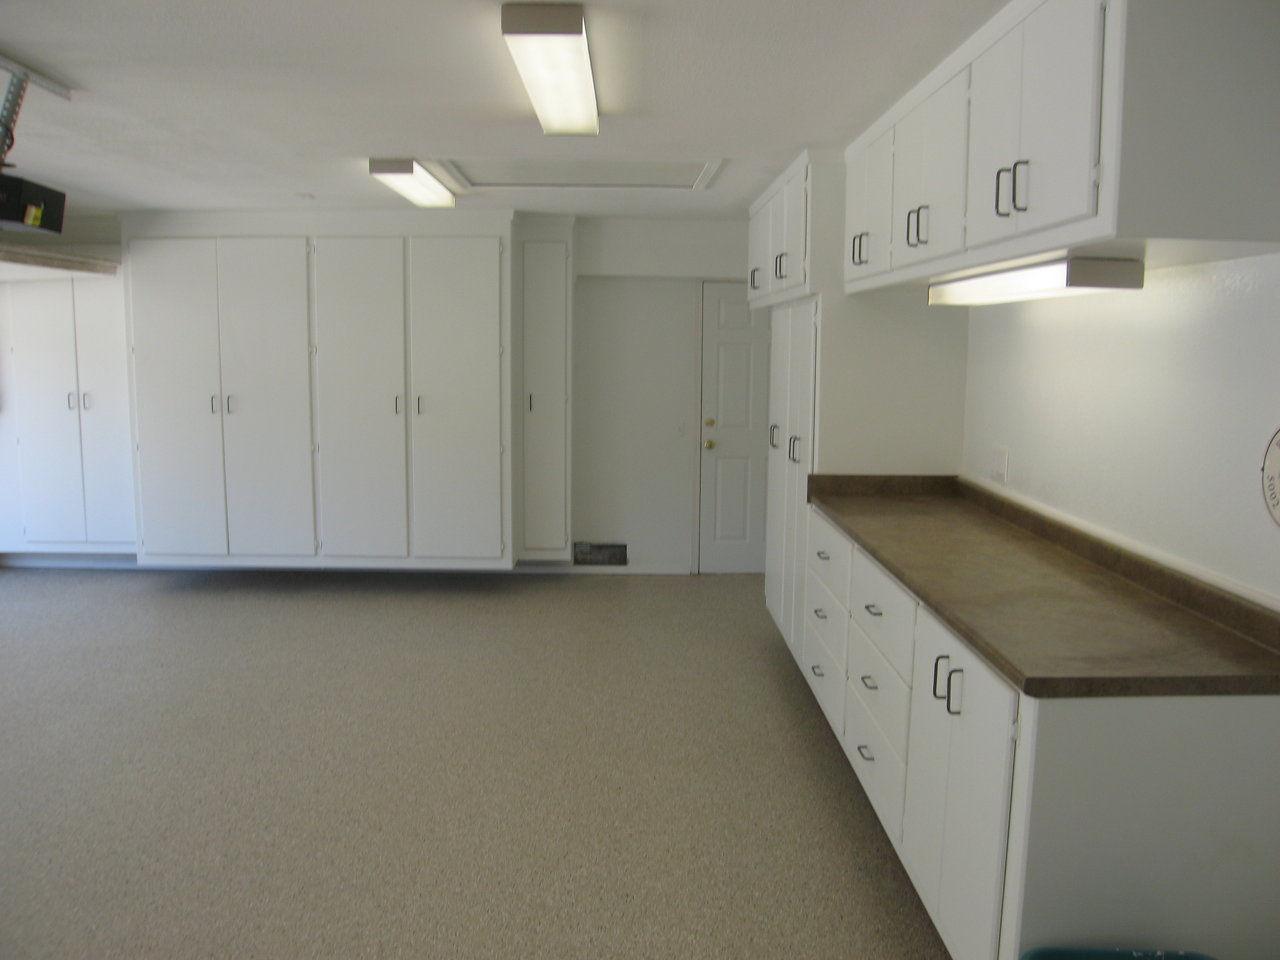 Floor To Ceiling Garage Cabinets Garage Cabinets And Epoxy Floor Coatings California Garage